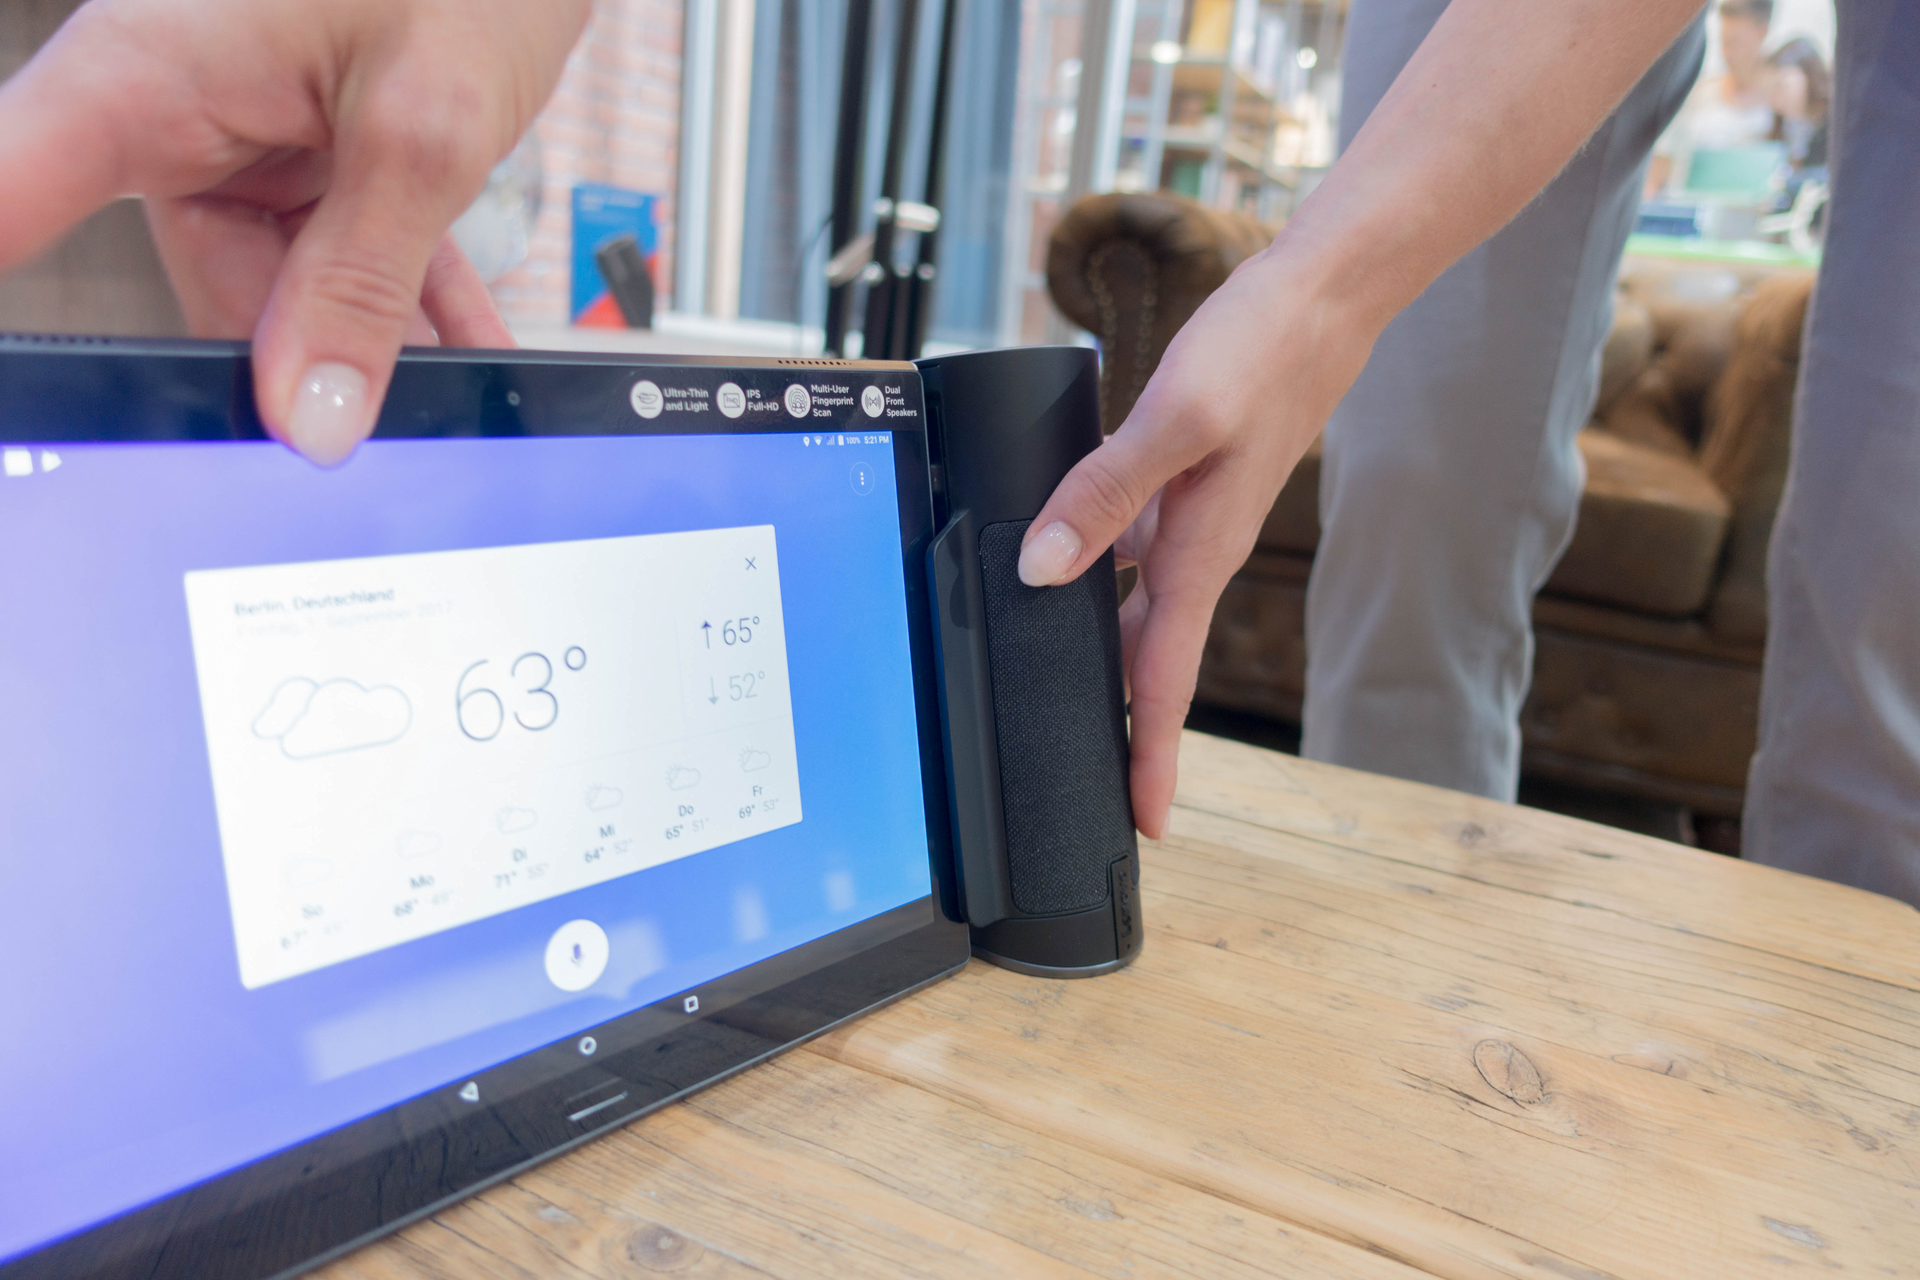 Alexa und Google Assistant: Der Wettkampf smarter Lautsprecher verändert sich - Home Assistant (Bild: Ingo Pakalski/Golem.de)